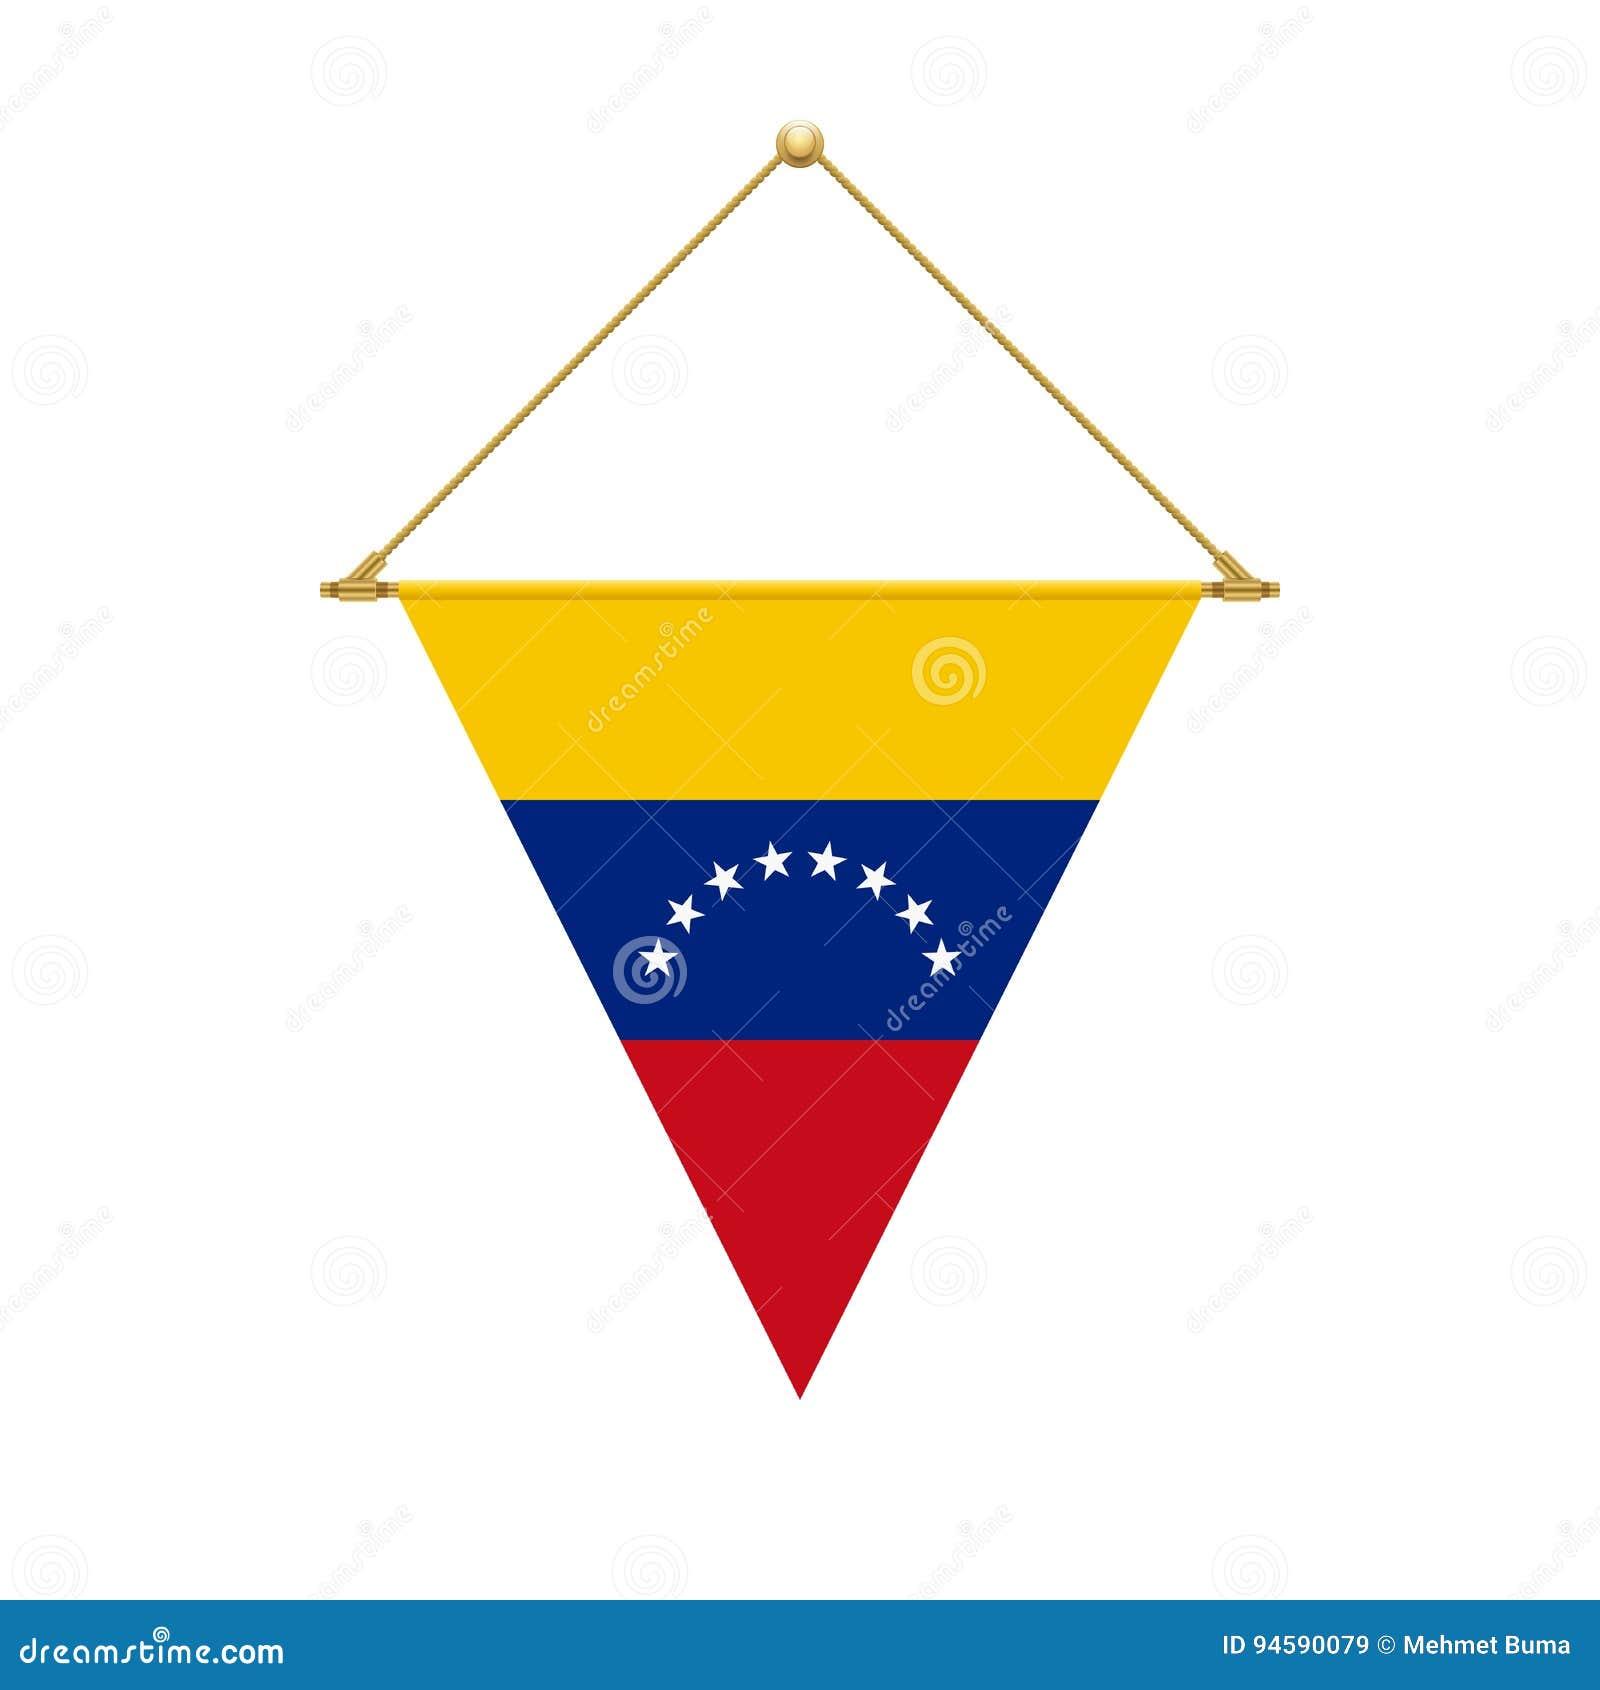 Venezuelan triangle flag hanging illustration stock vector venezuelan triangle flag hanging illustration pronofoot35fo Gallery